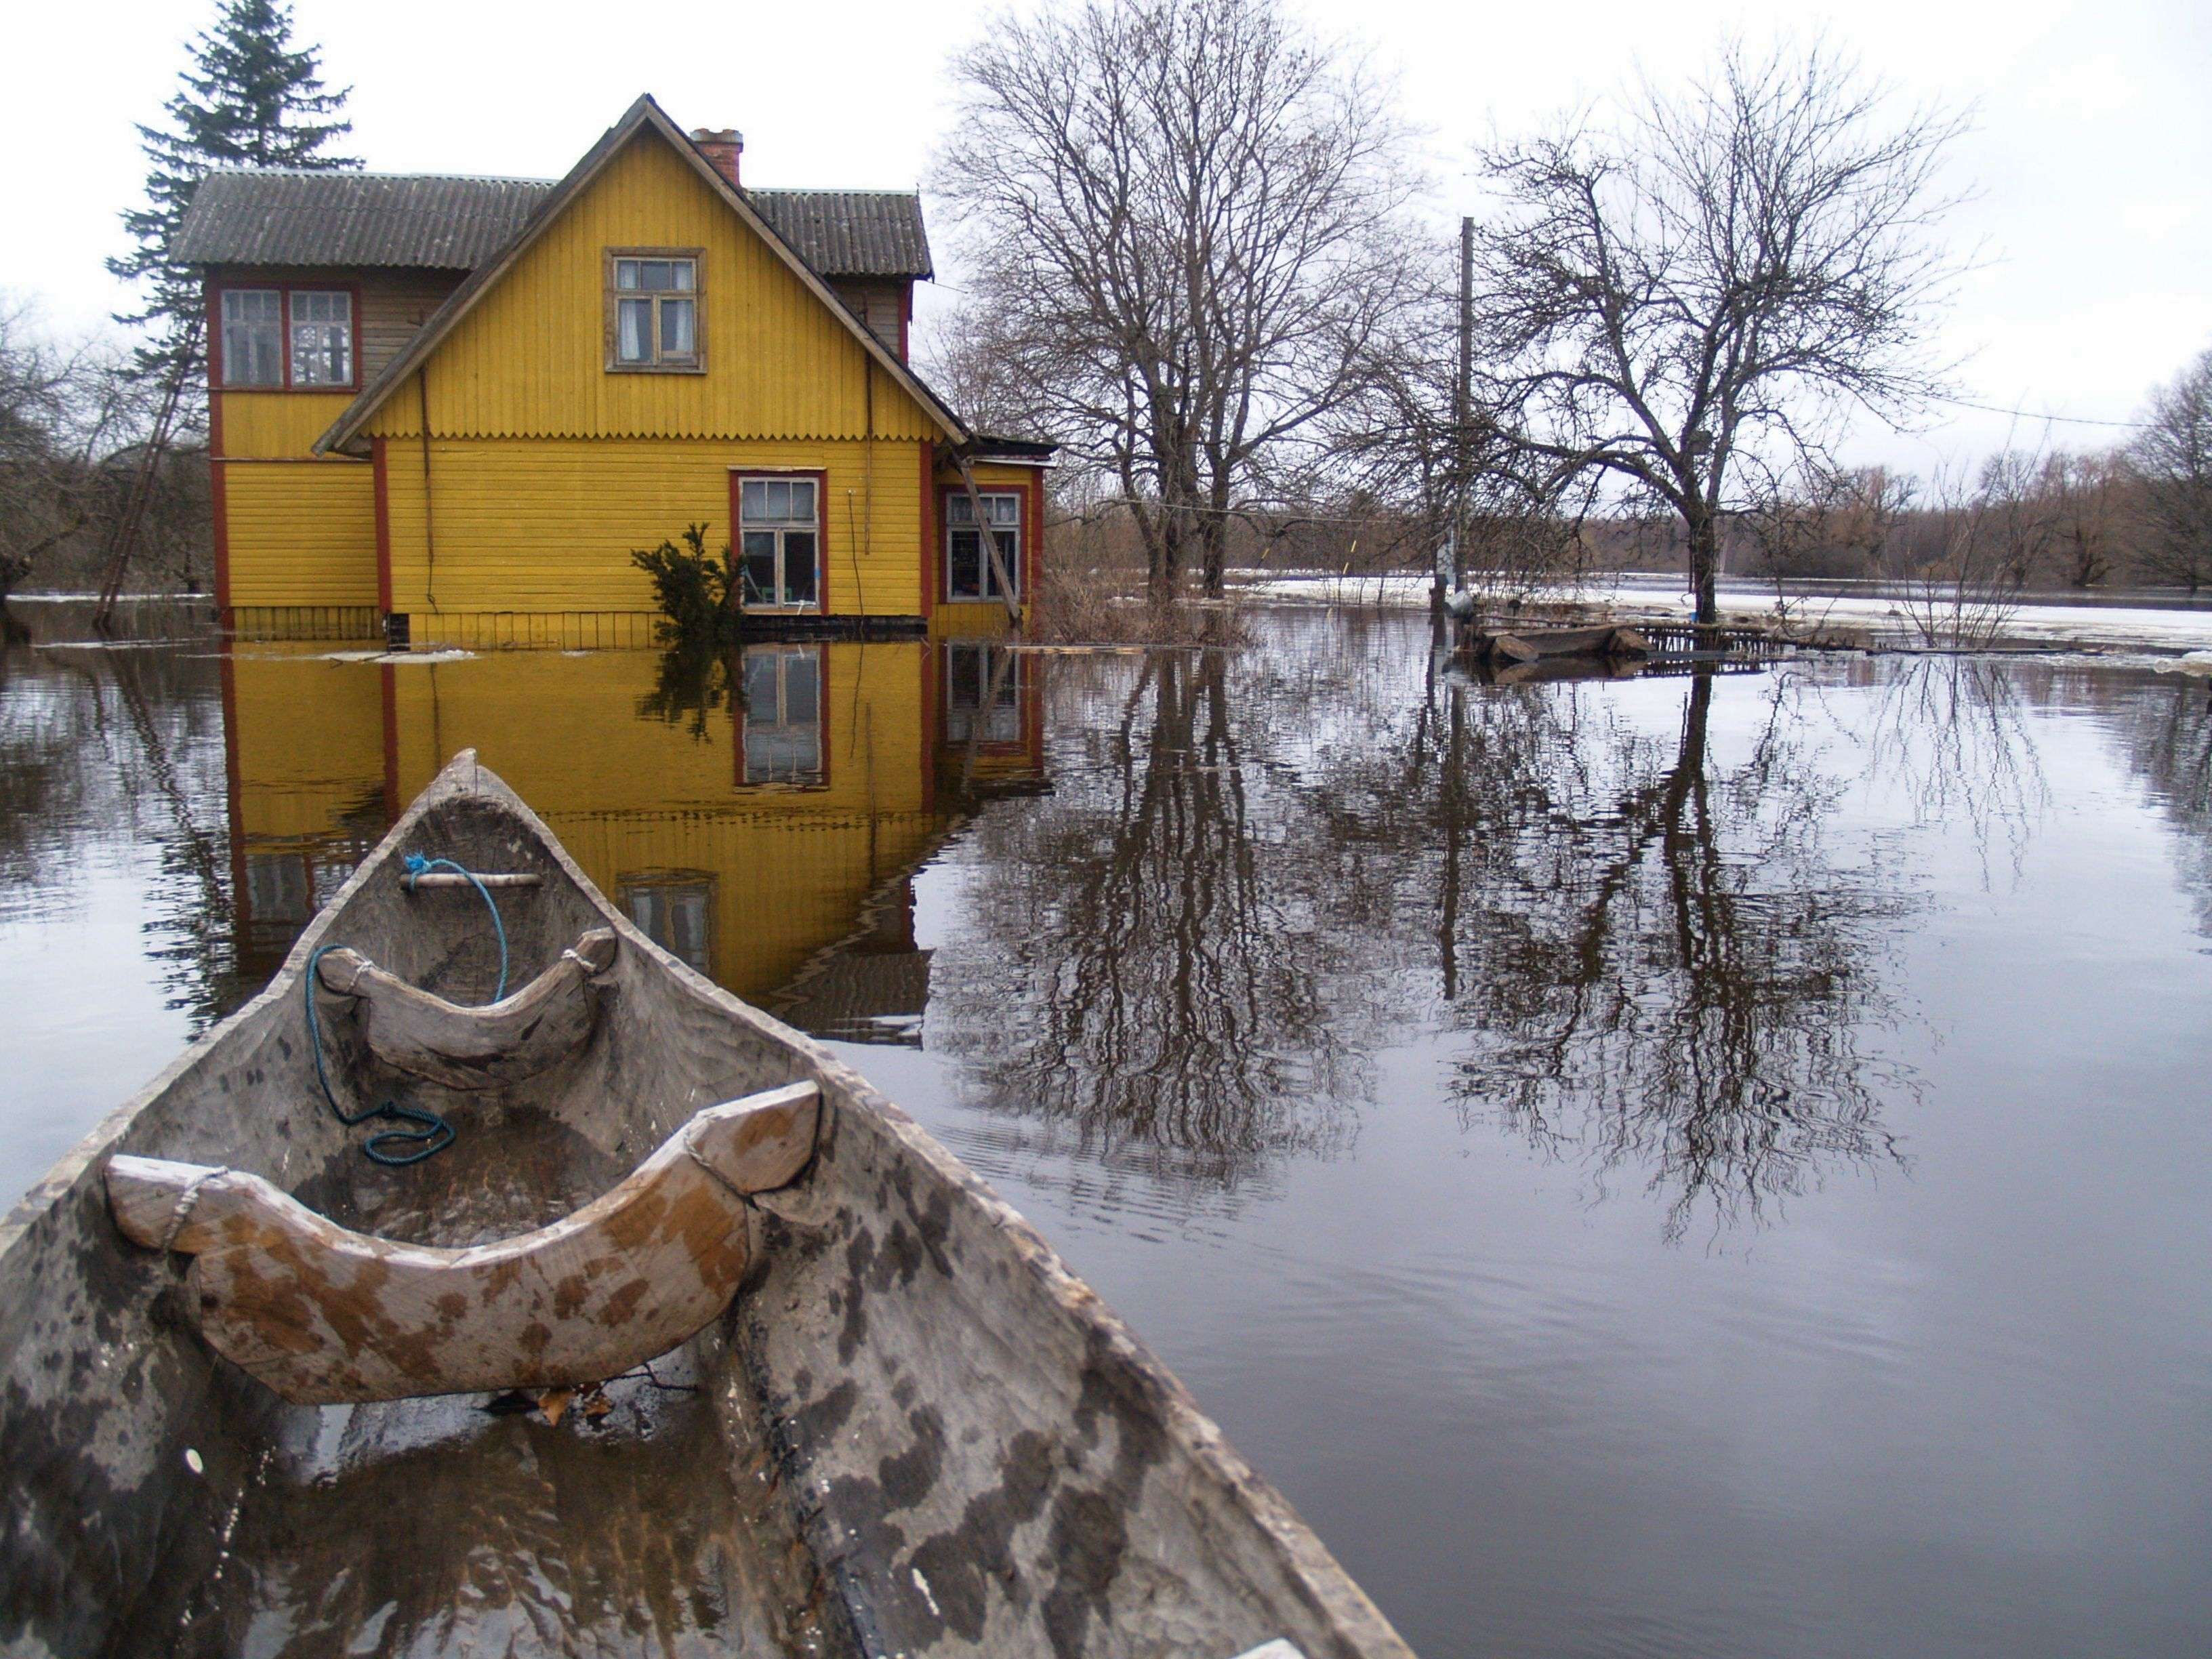 Dugout canoe traditionally used during flood season